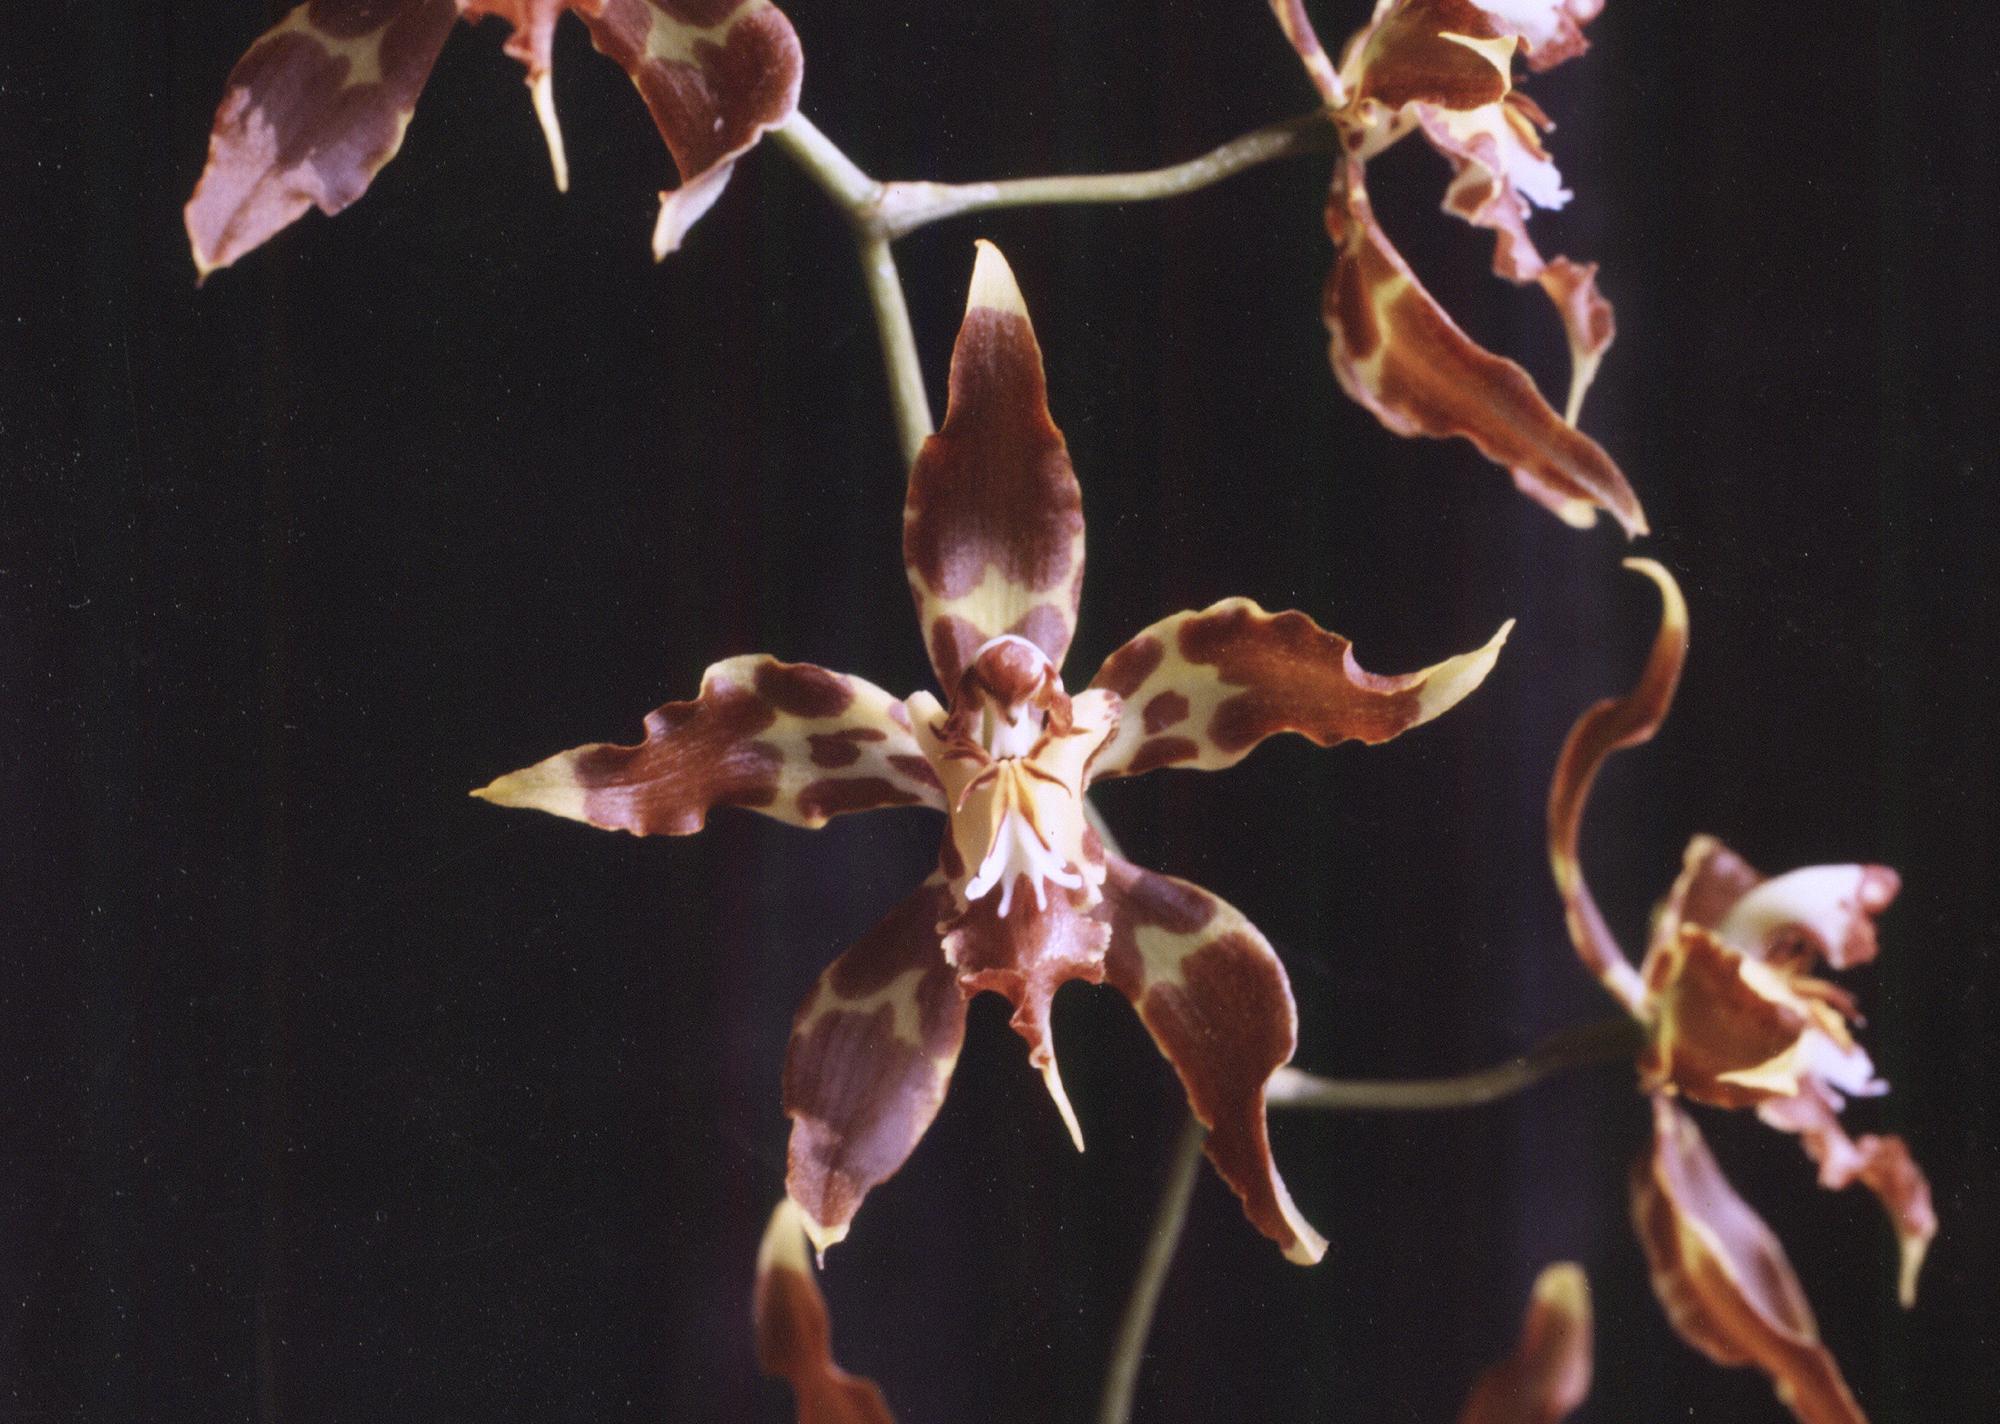 Image of odontoglossum